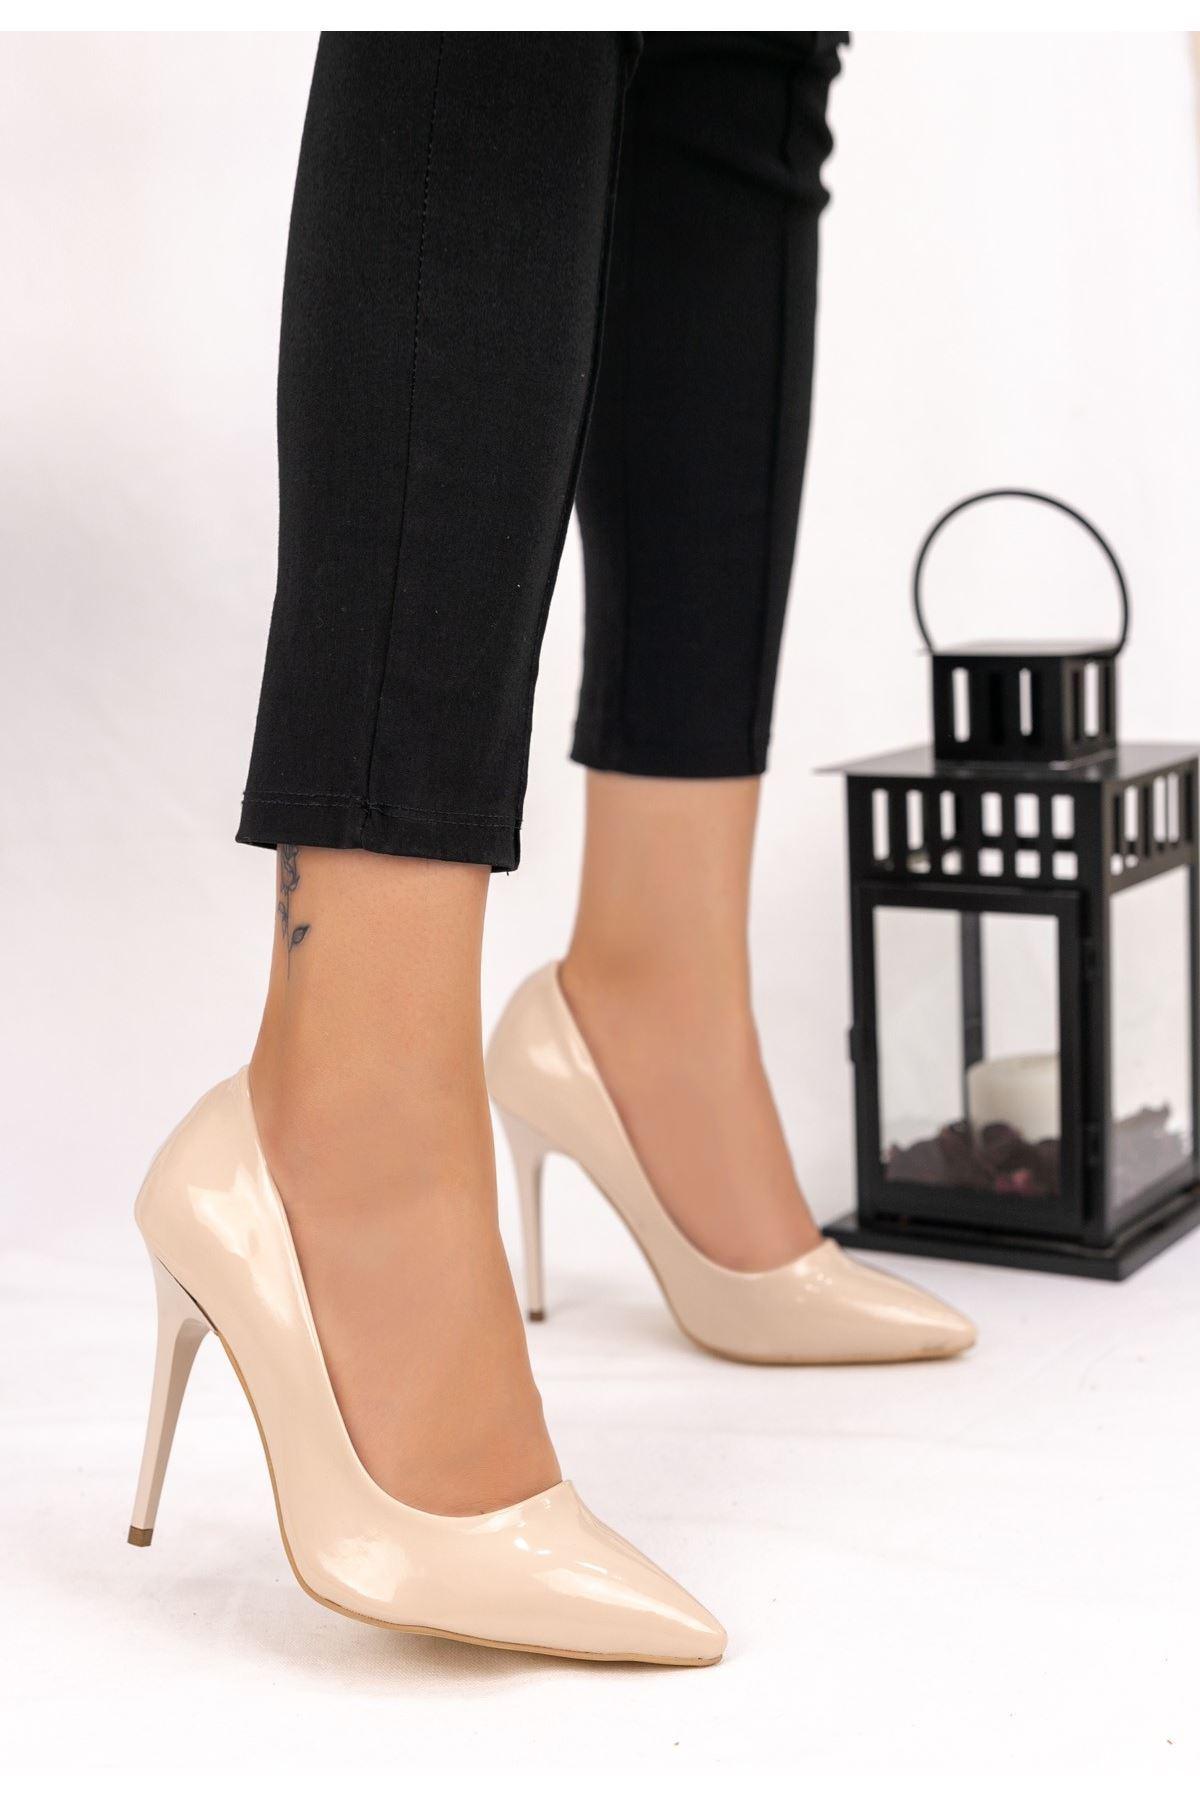 Muad Krem Rugan Stiletto Ayakkabı